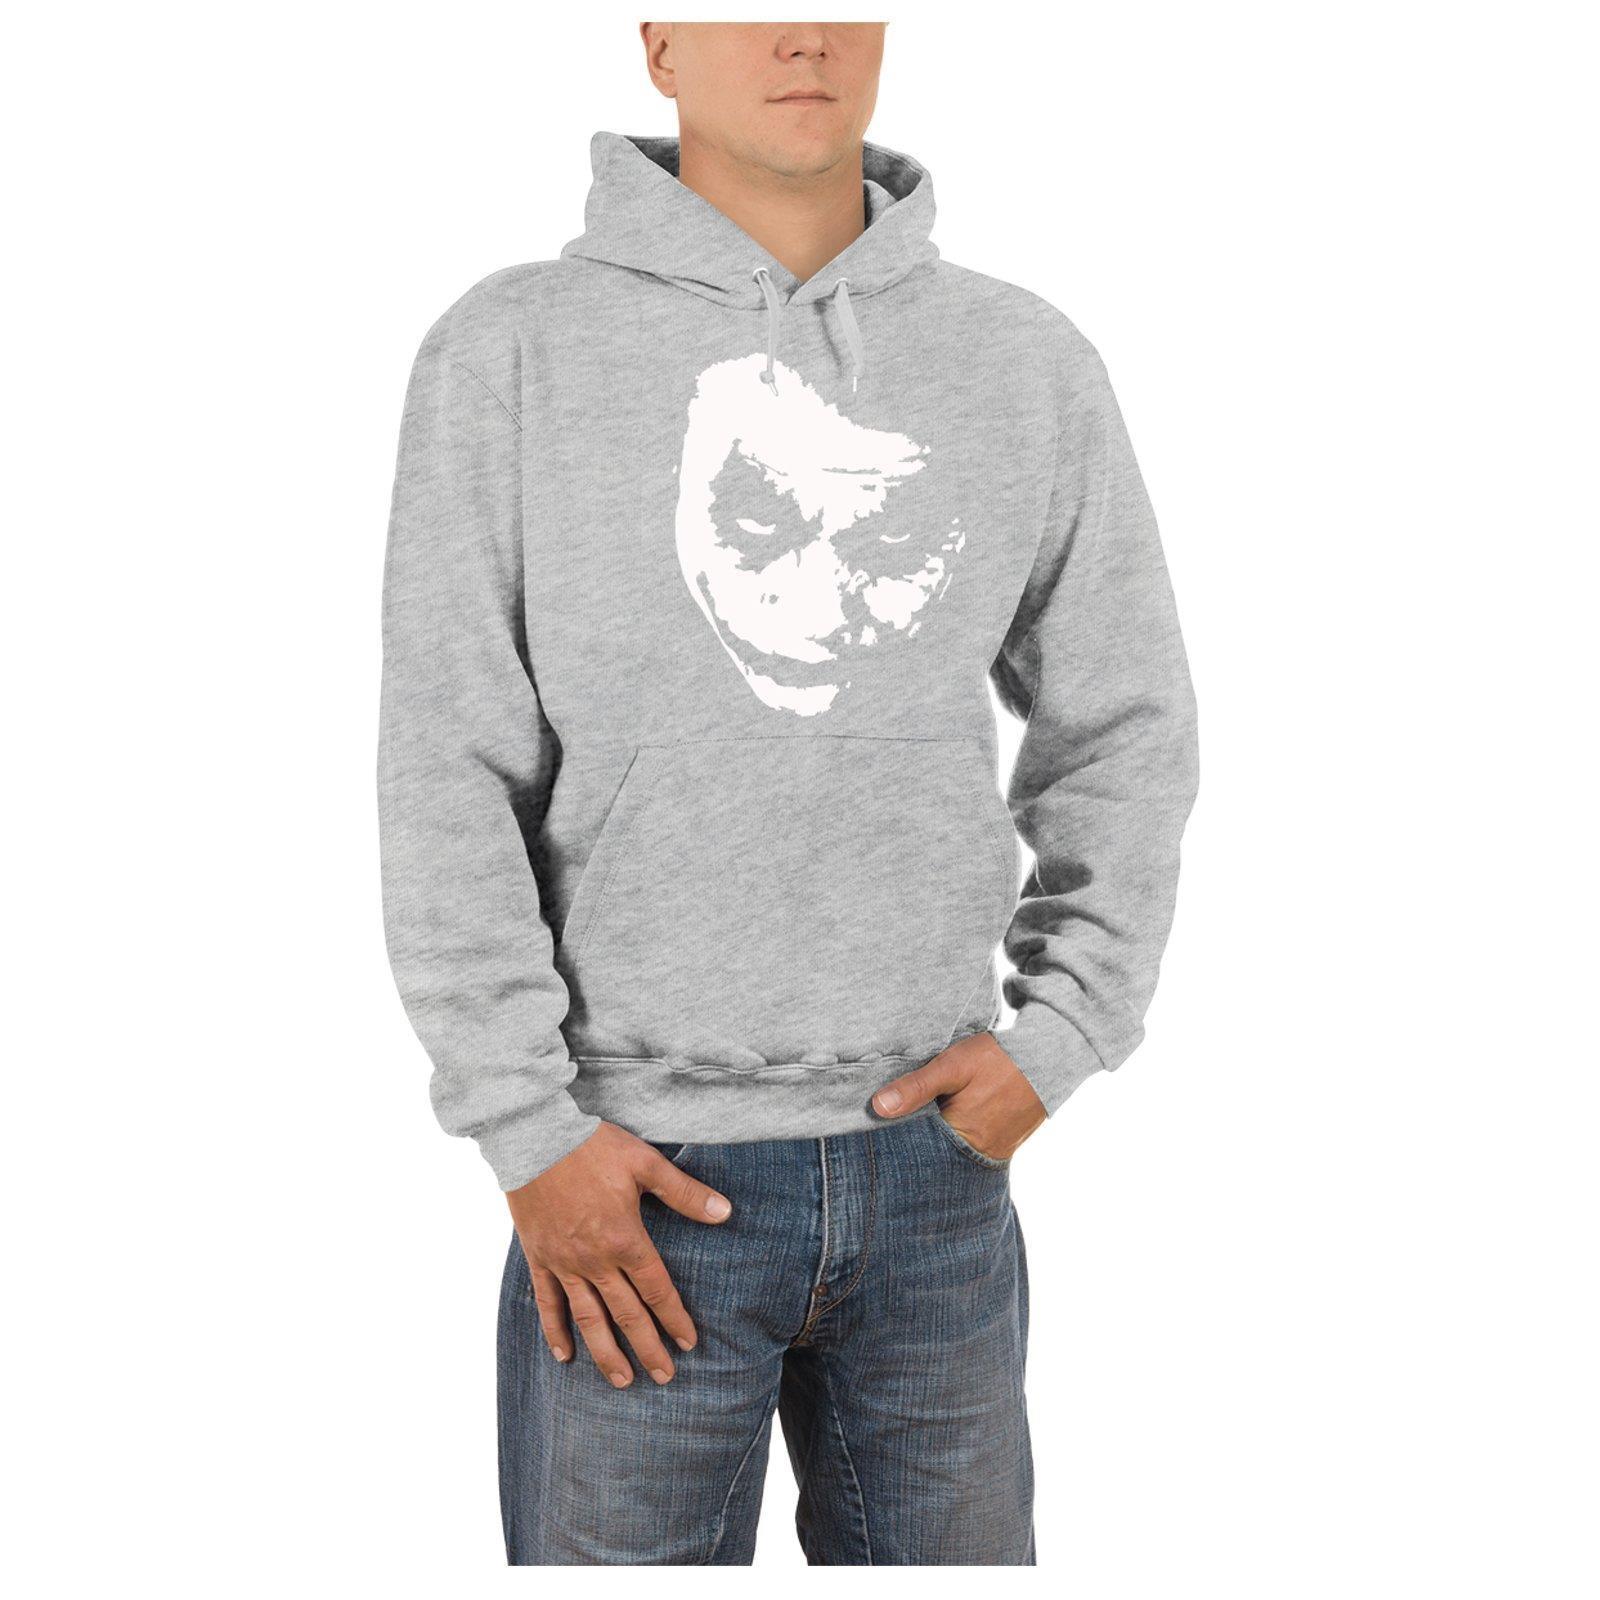 competitive price 2ff53 99b24 Details zu Kapuzen Pullover Joker Heath Ledger Why So Serious DC Batman  Hoodie Herren Warm